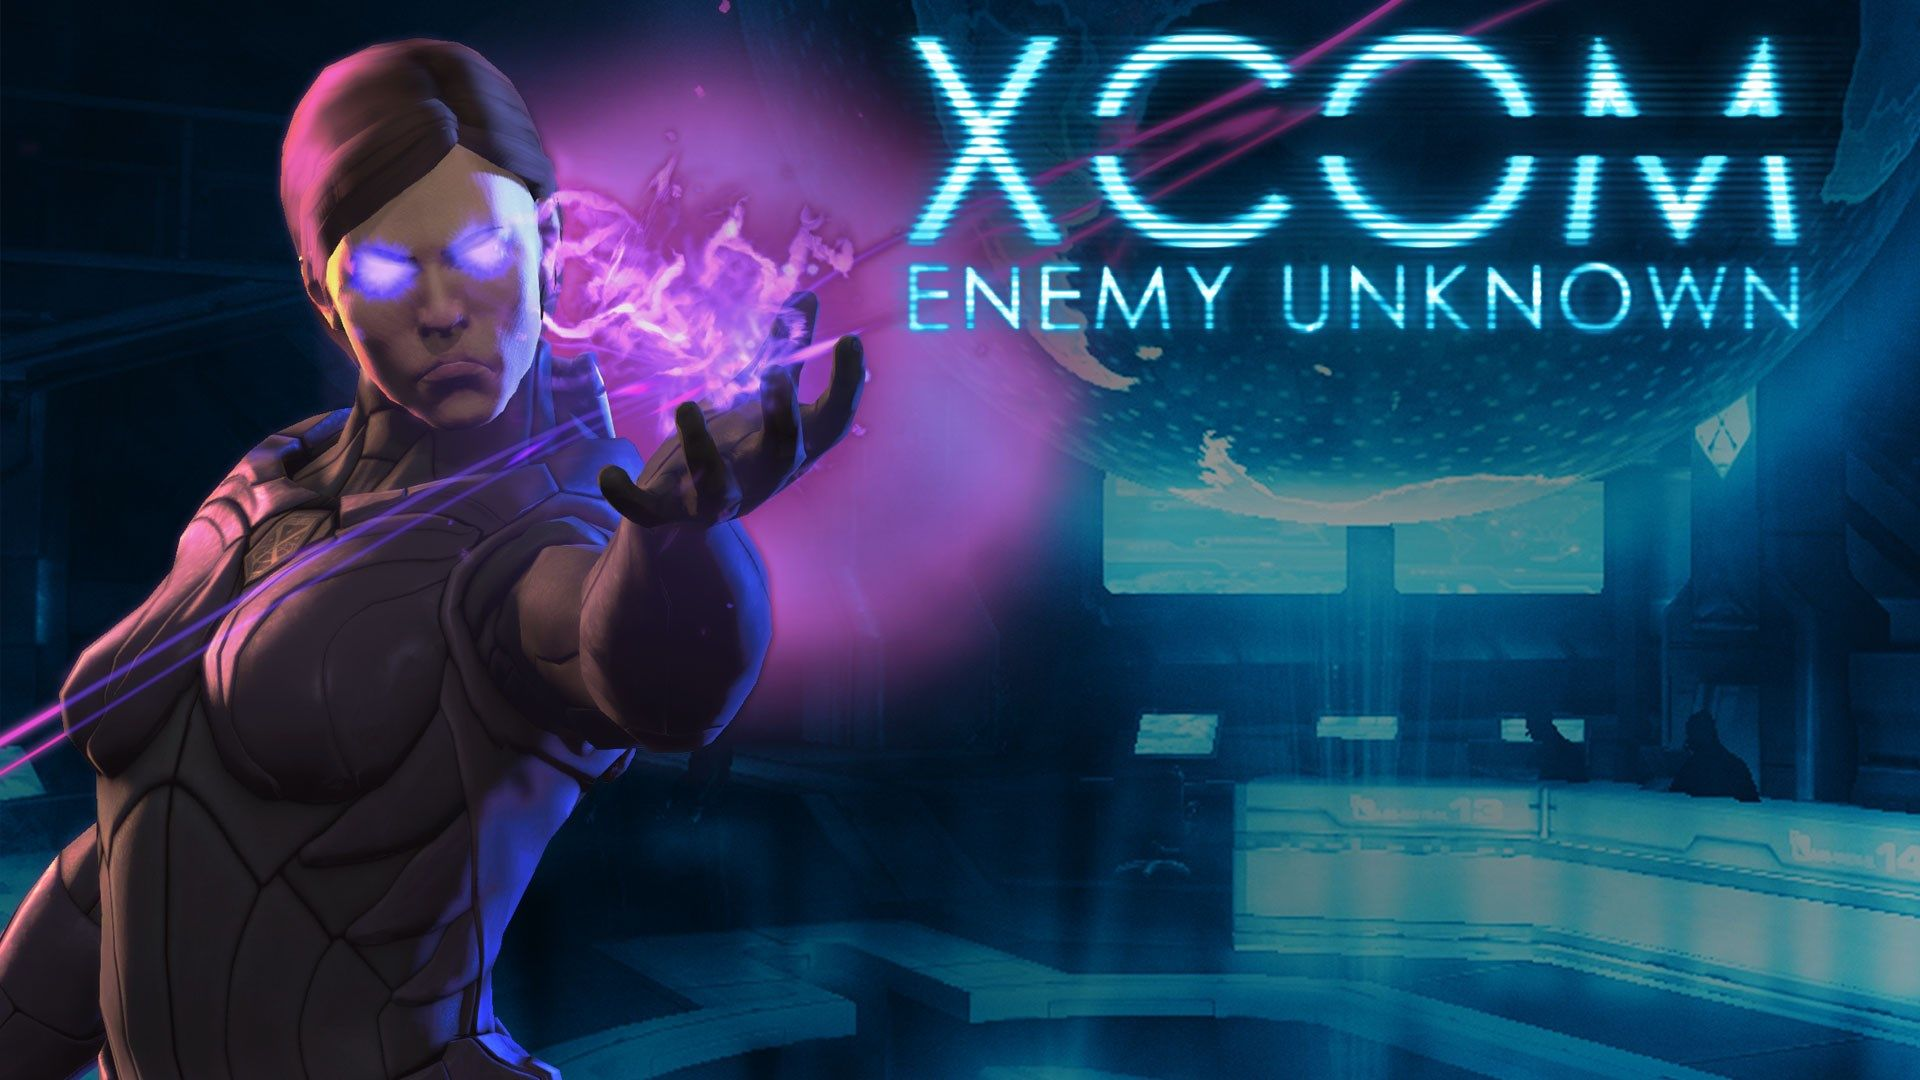 Desktop Wallpaper For Xcom Enemy Unknown Xcom Enemy Unknown Category Unknow Enemy Steam